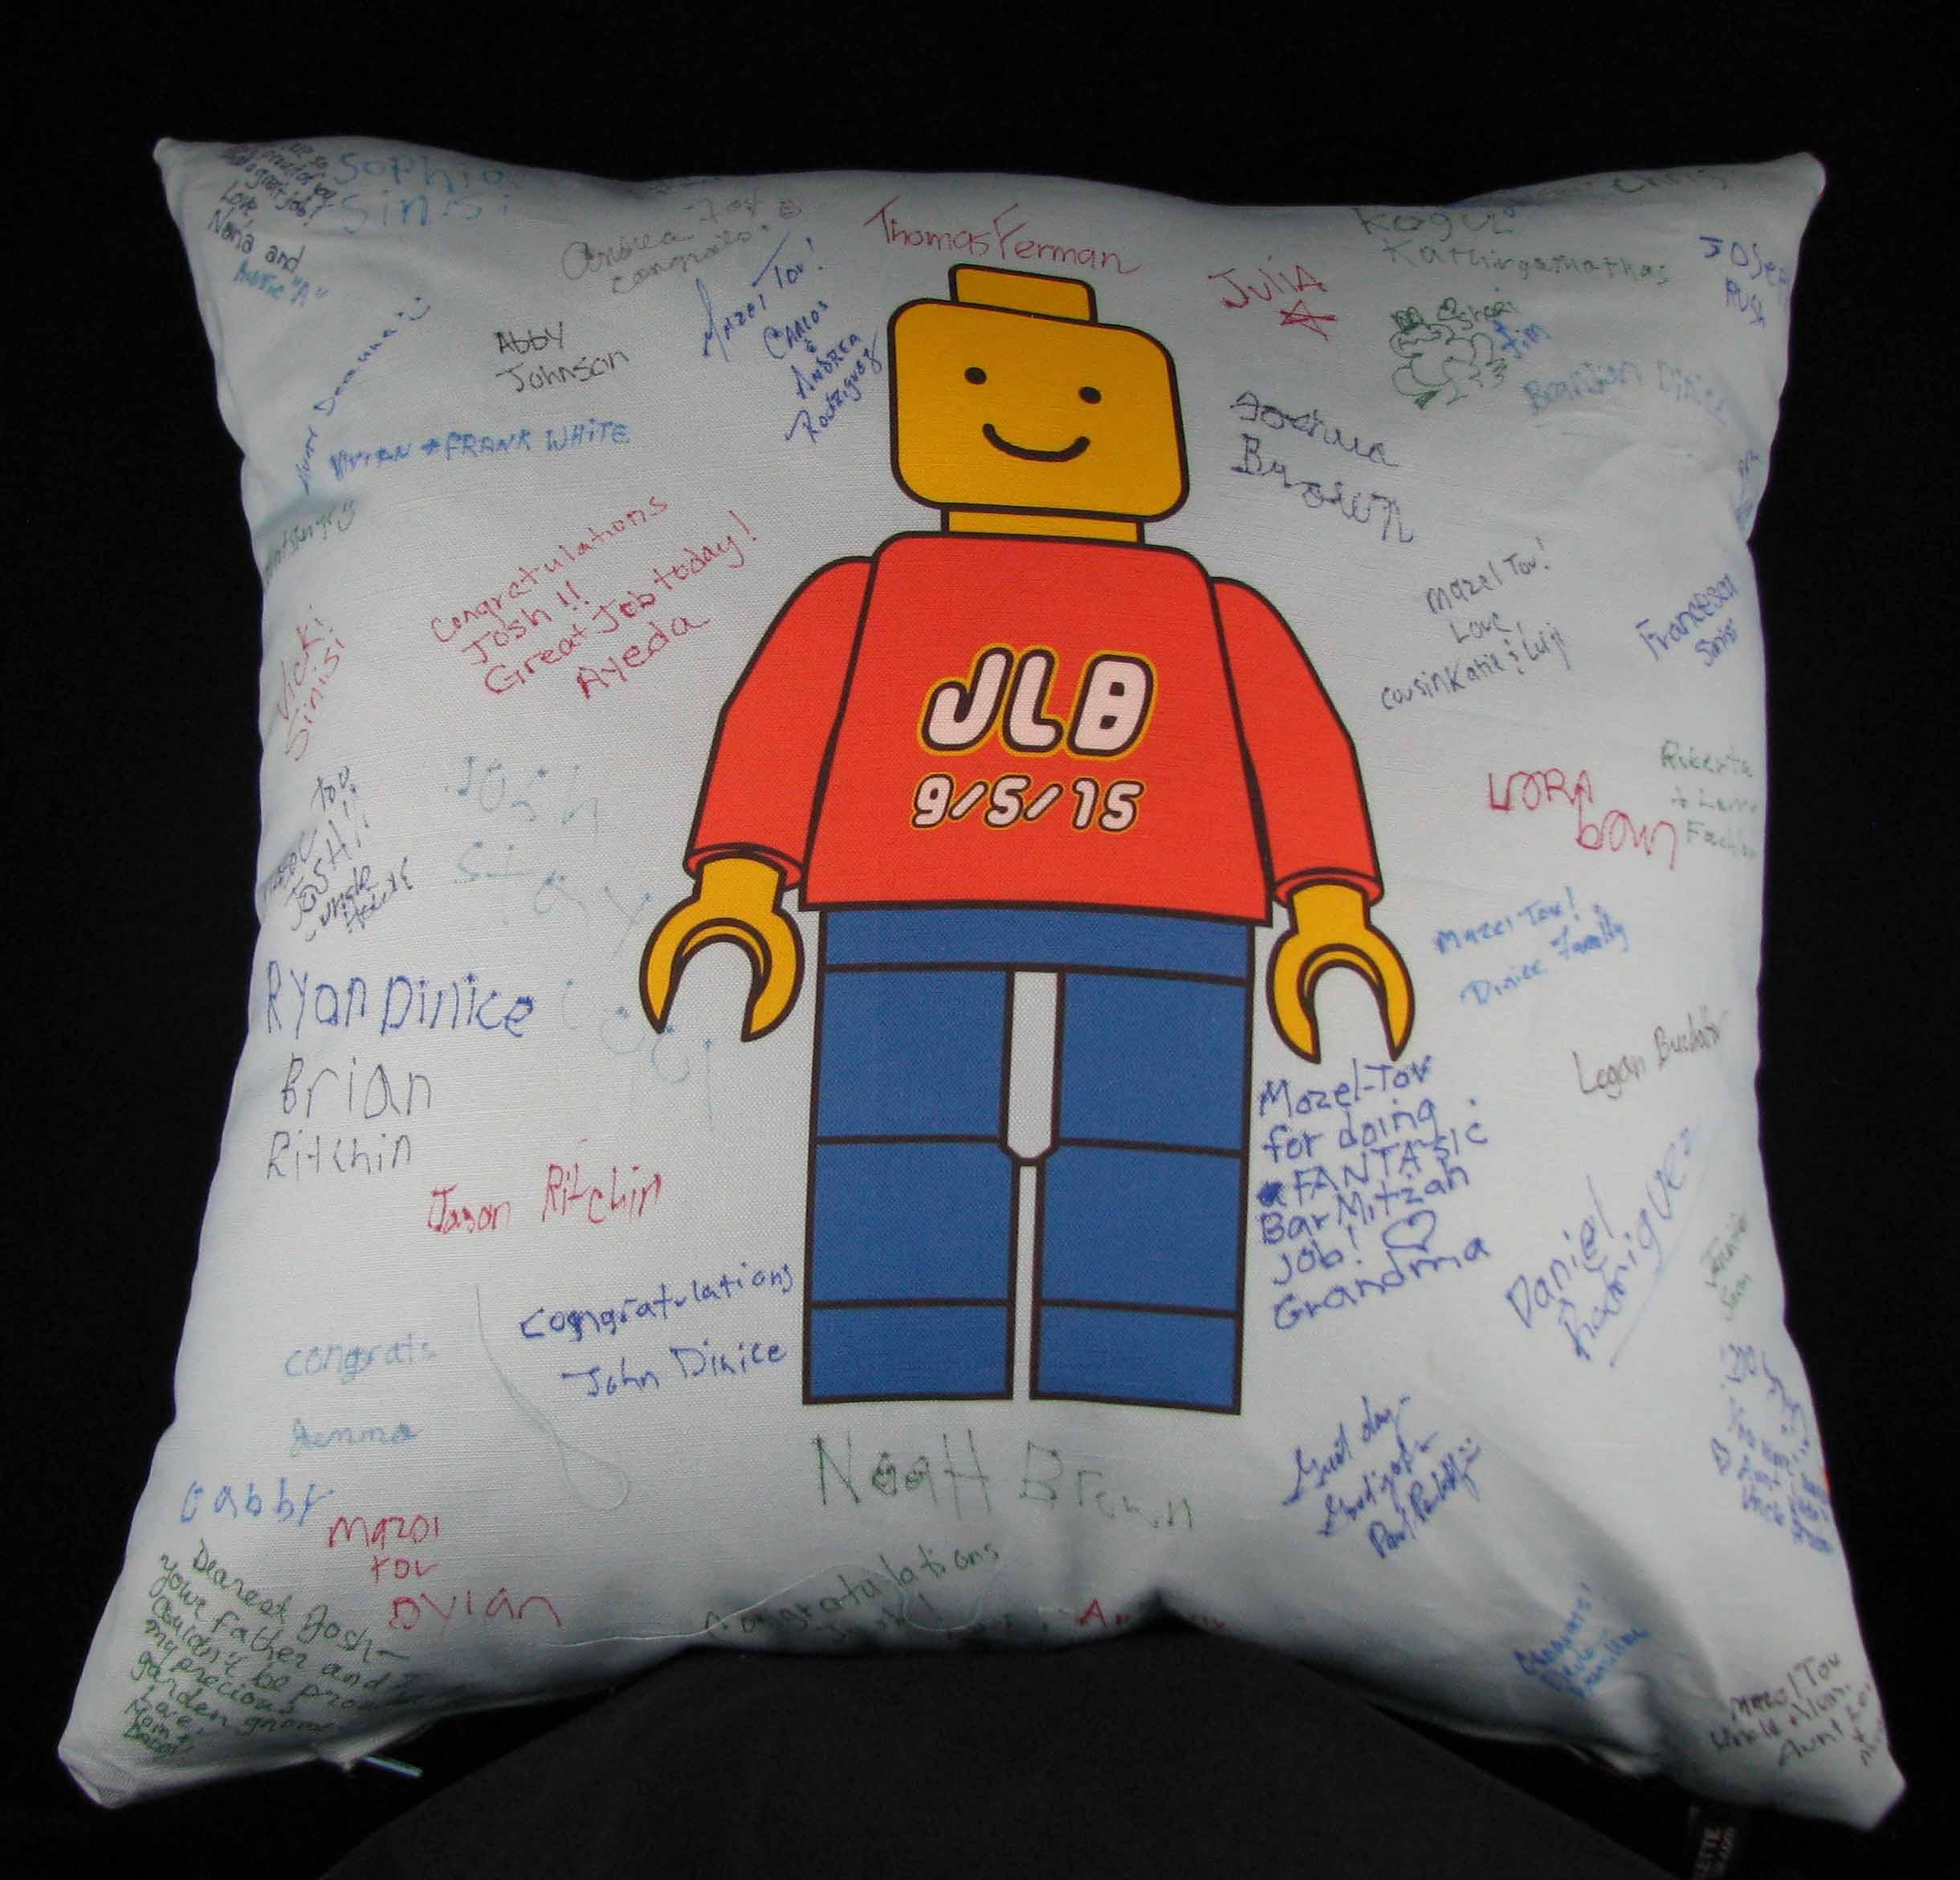 JLB'S LEGOMAN PILLOW